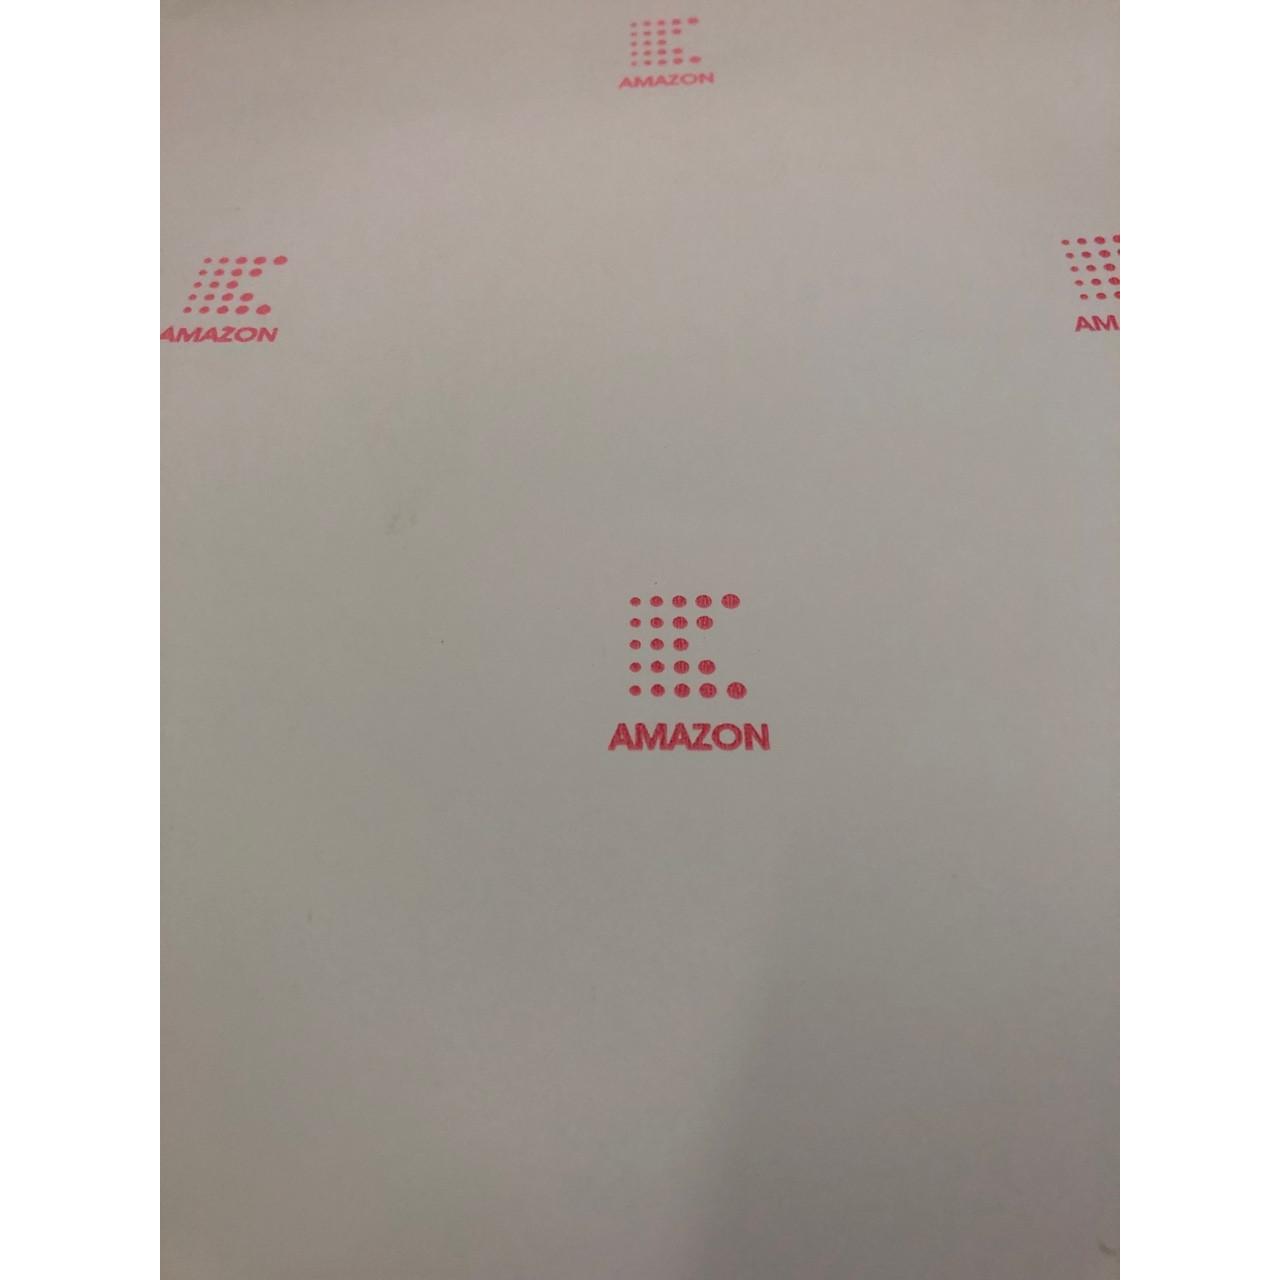 Decal nhựa trong suốt khổ A4 (100 tờ)